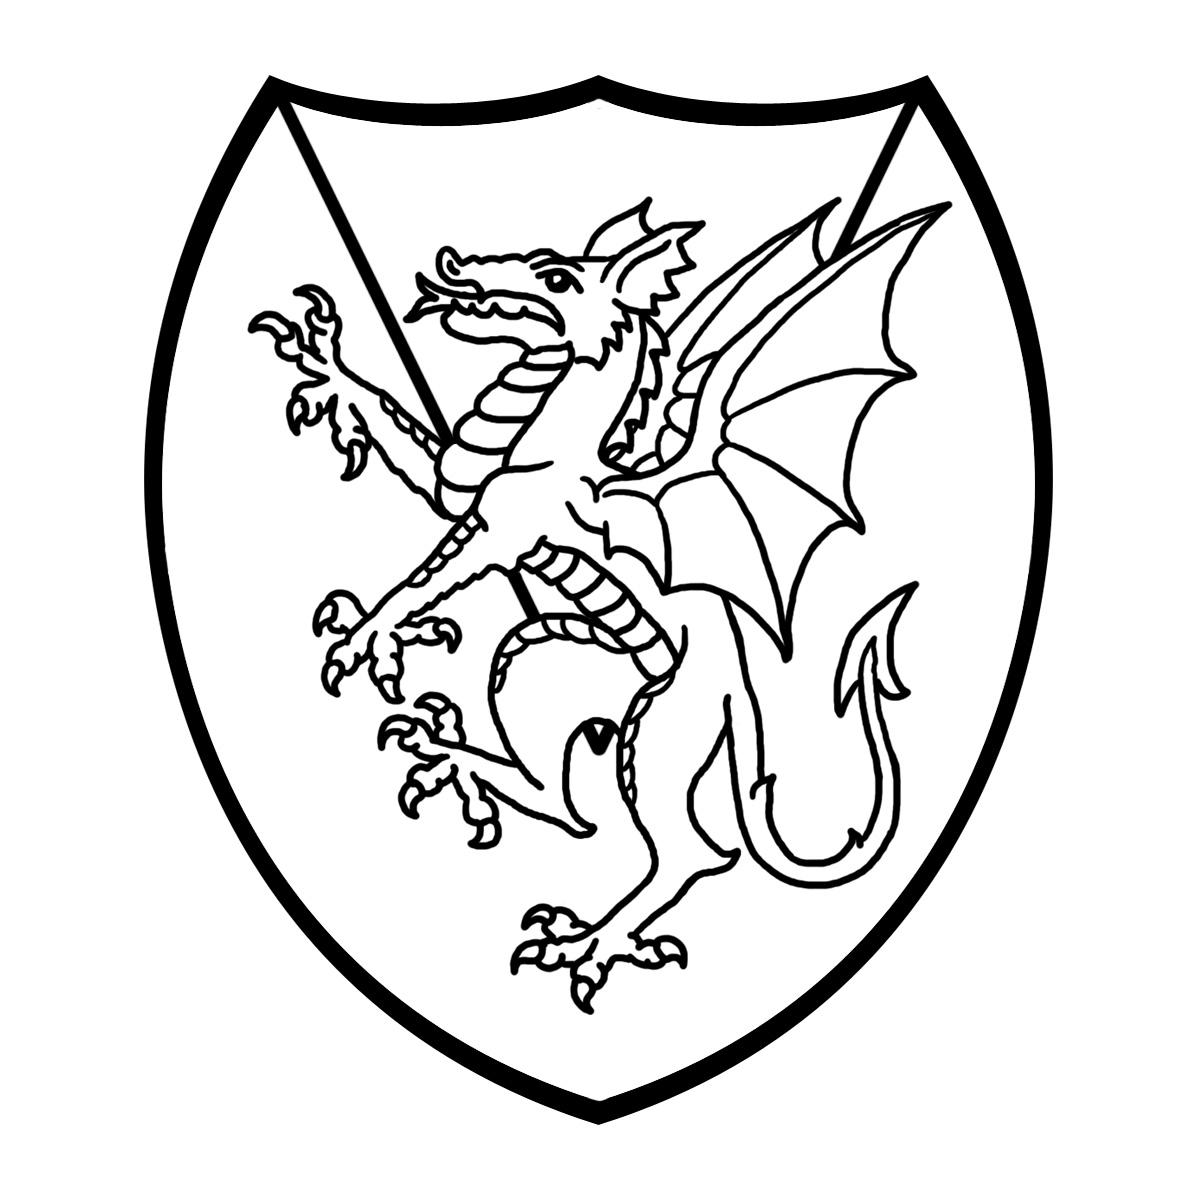 How to breed heraldic dragon - Heraldry Clipart